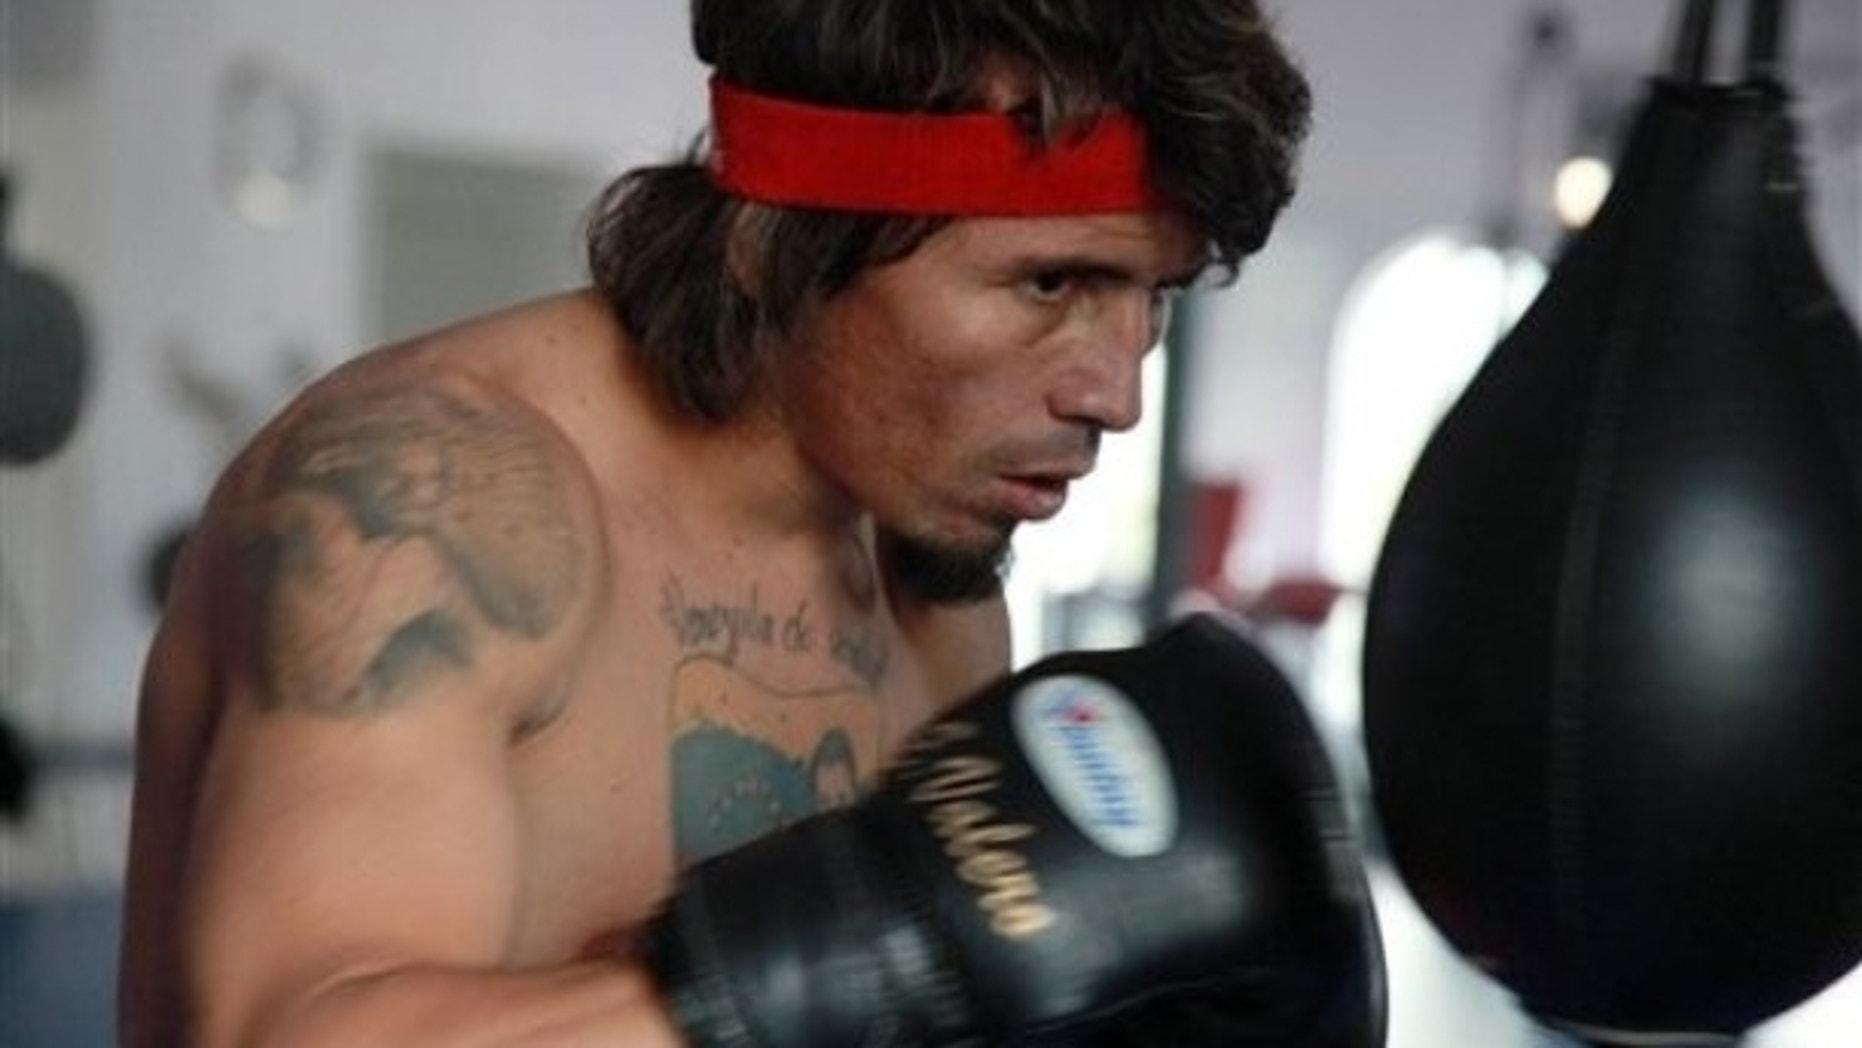 Feb. 3: Edwin Valero, of Venezuela, works out at Thai Champ Ringside Gym.